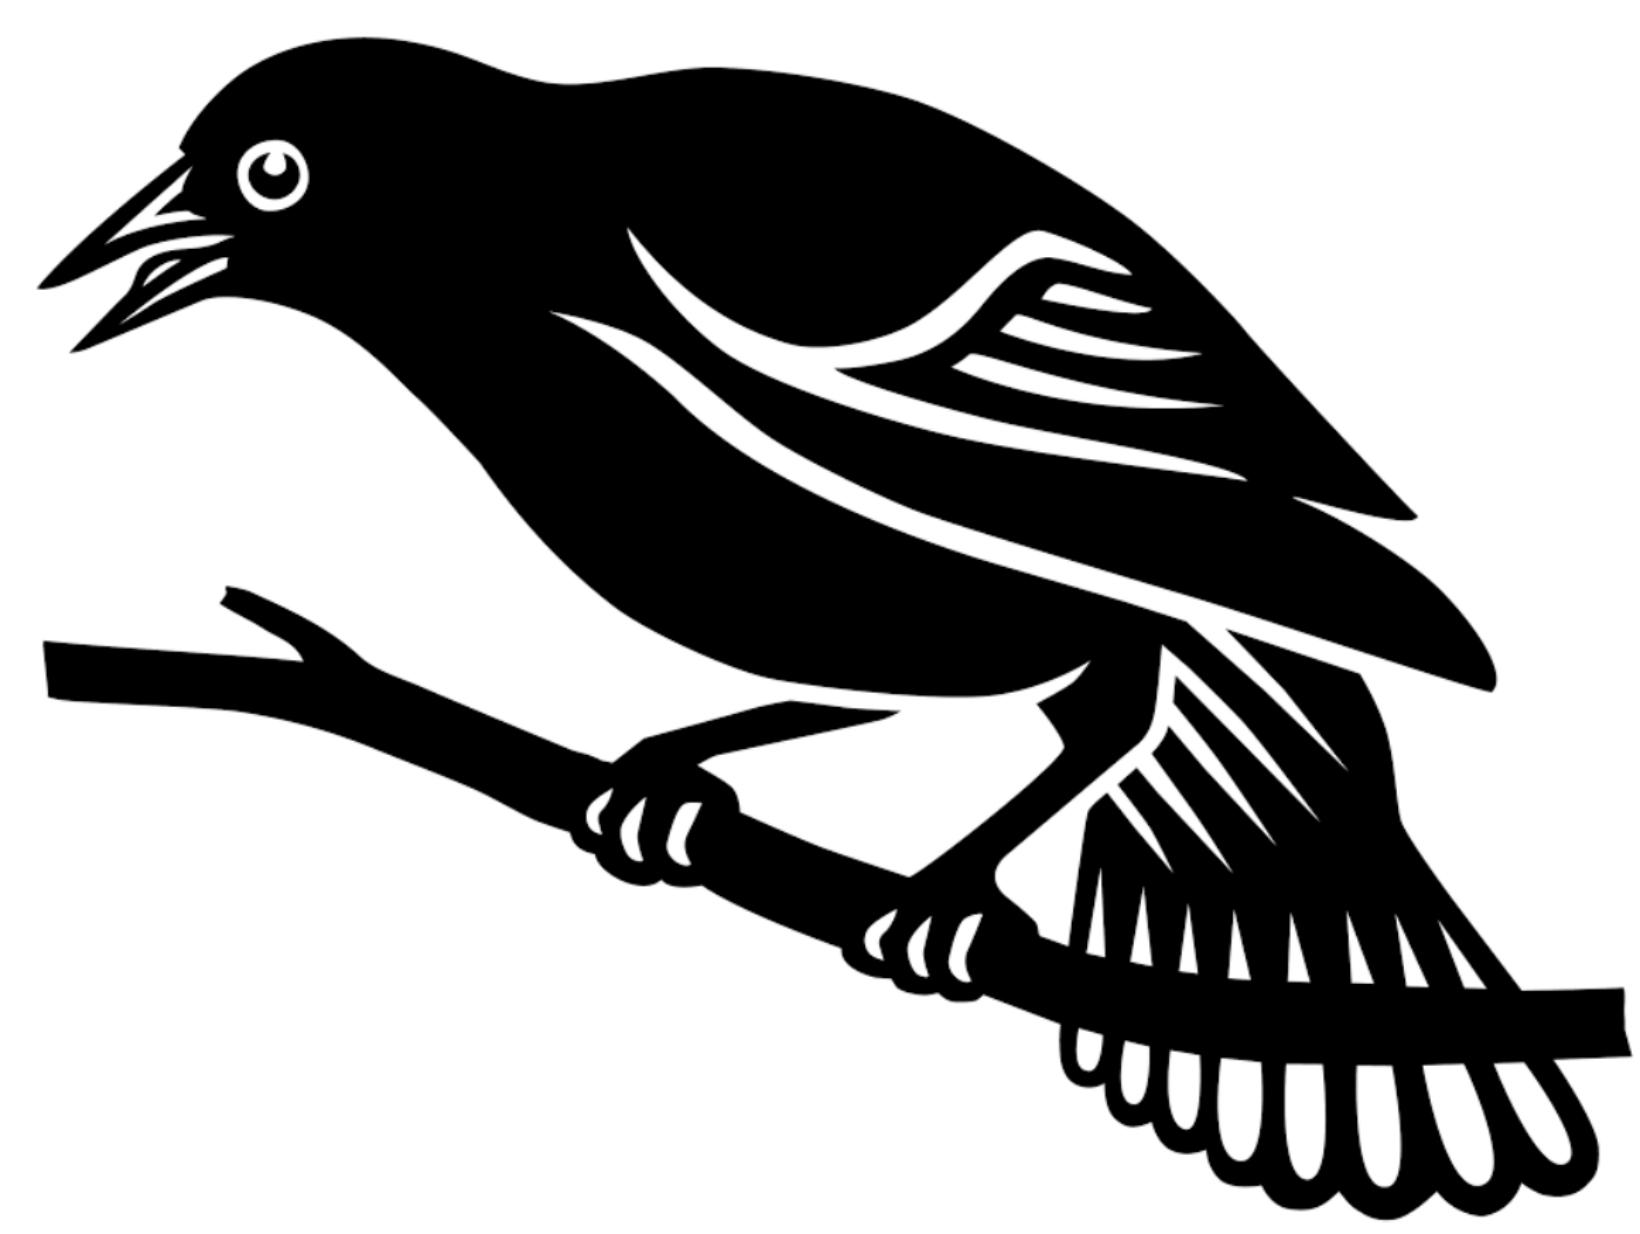 BlackBirdNewLogobig.jpg